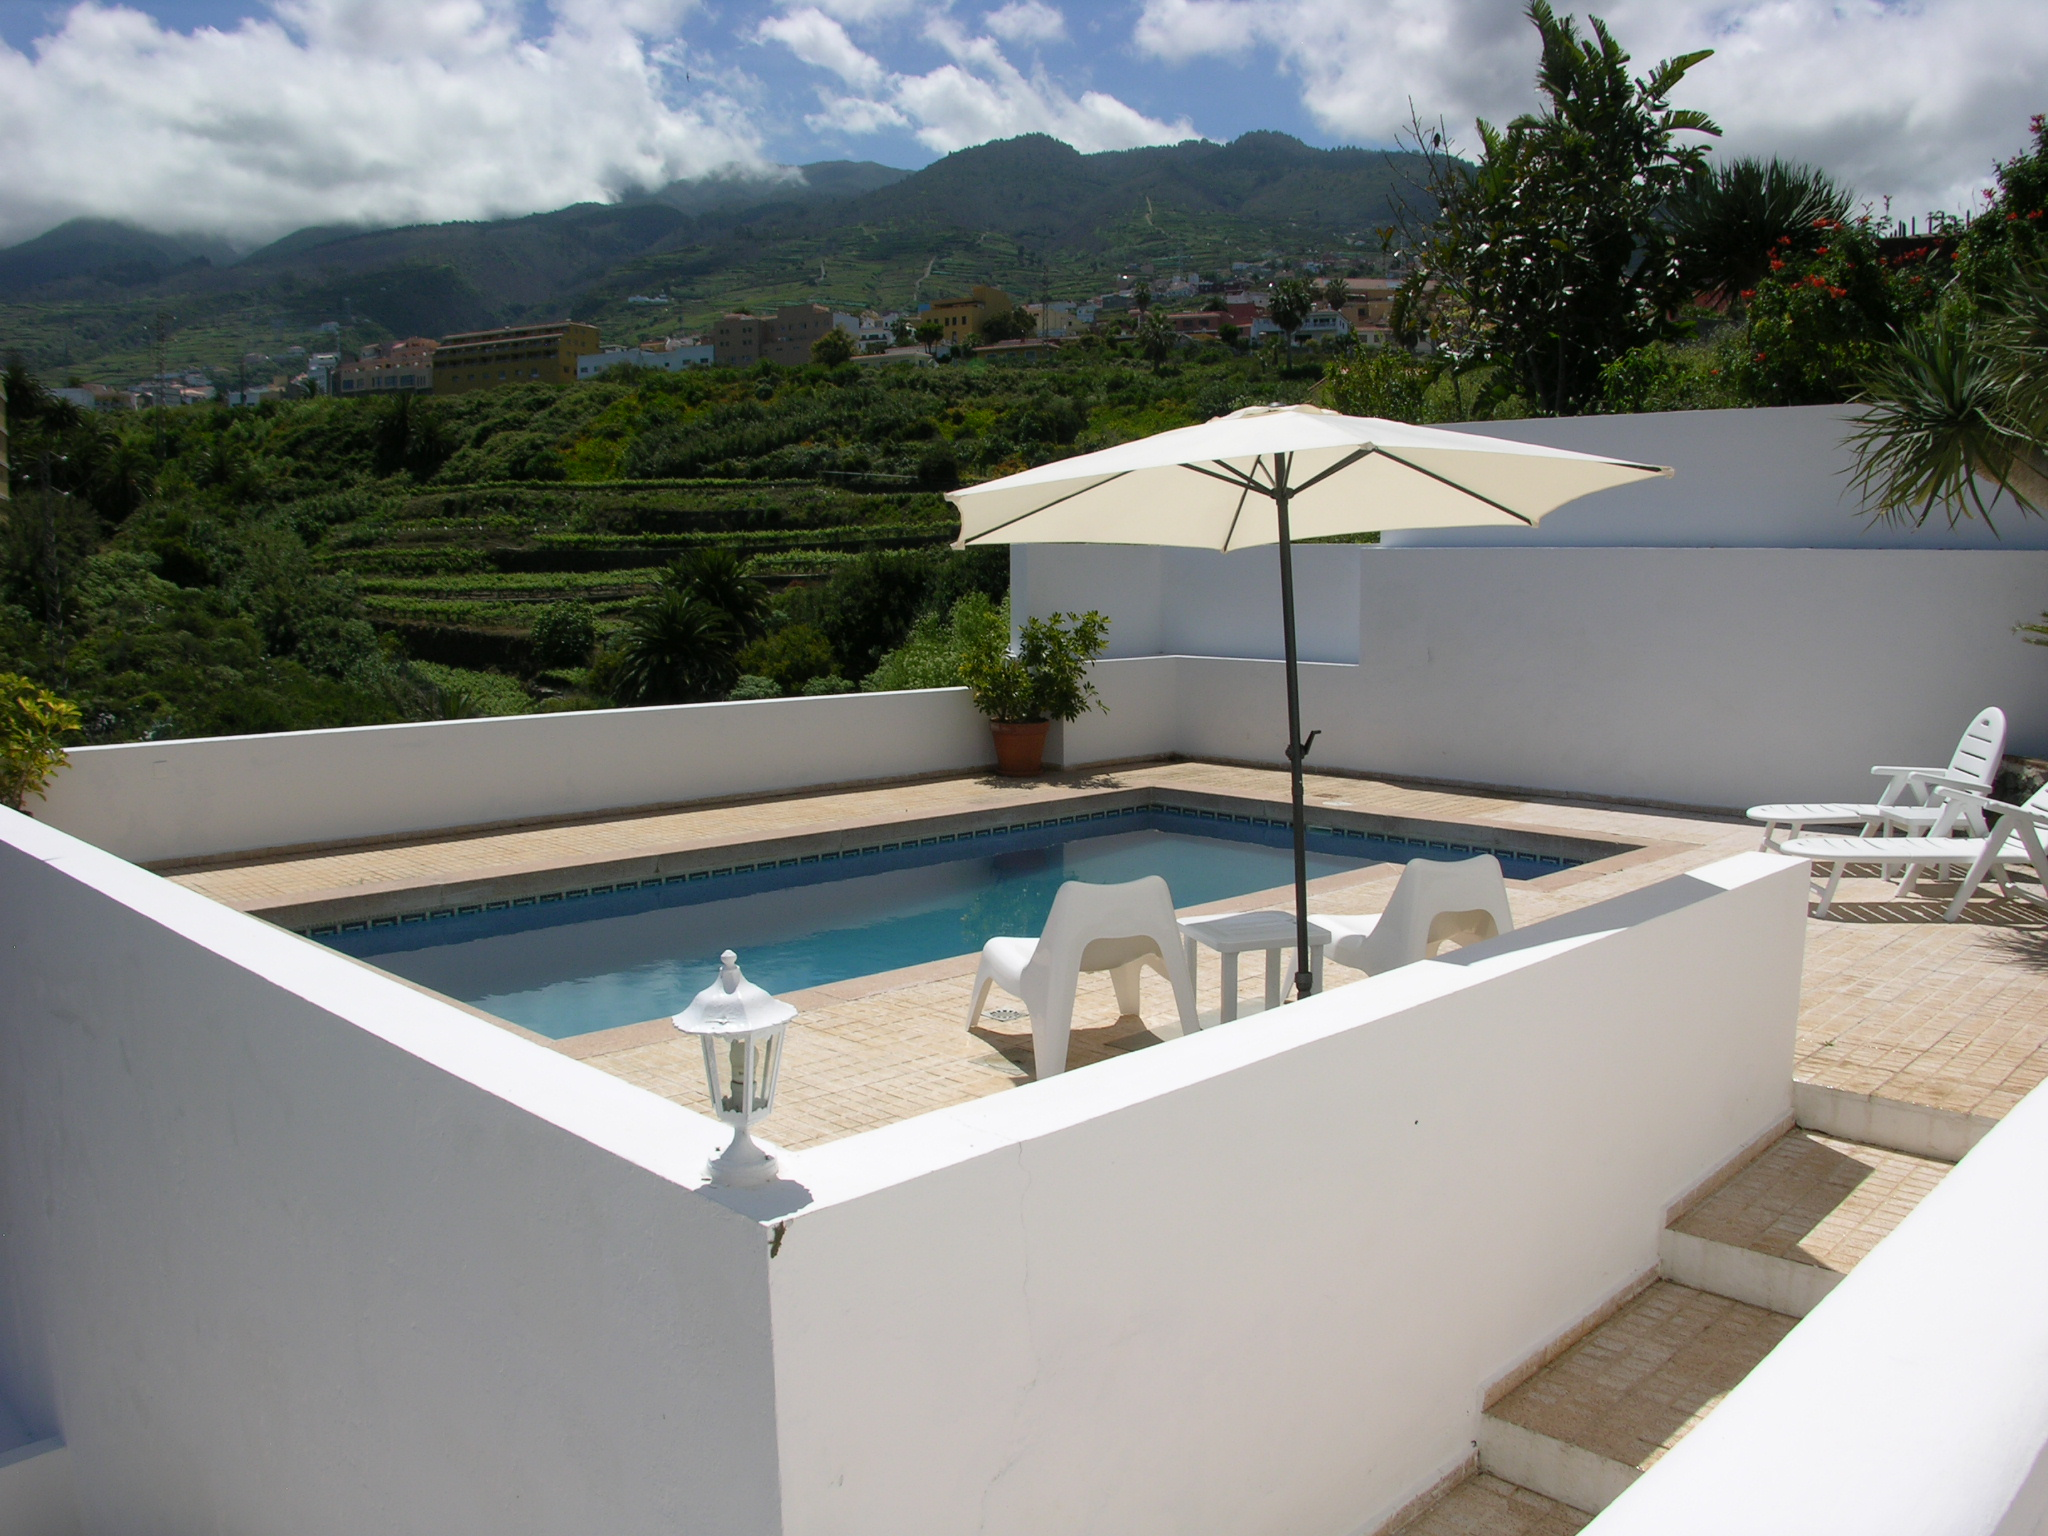 Maison de vacances Villa Vista La Quinta beheizbarer Pool kostenloses WLAN Grill (2124407), Santa Ursula, Ténérife, Iles Canaries, Espagne, image 54